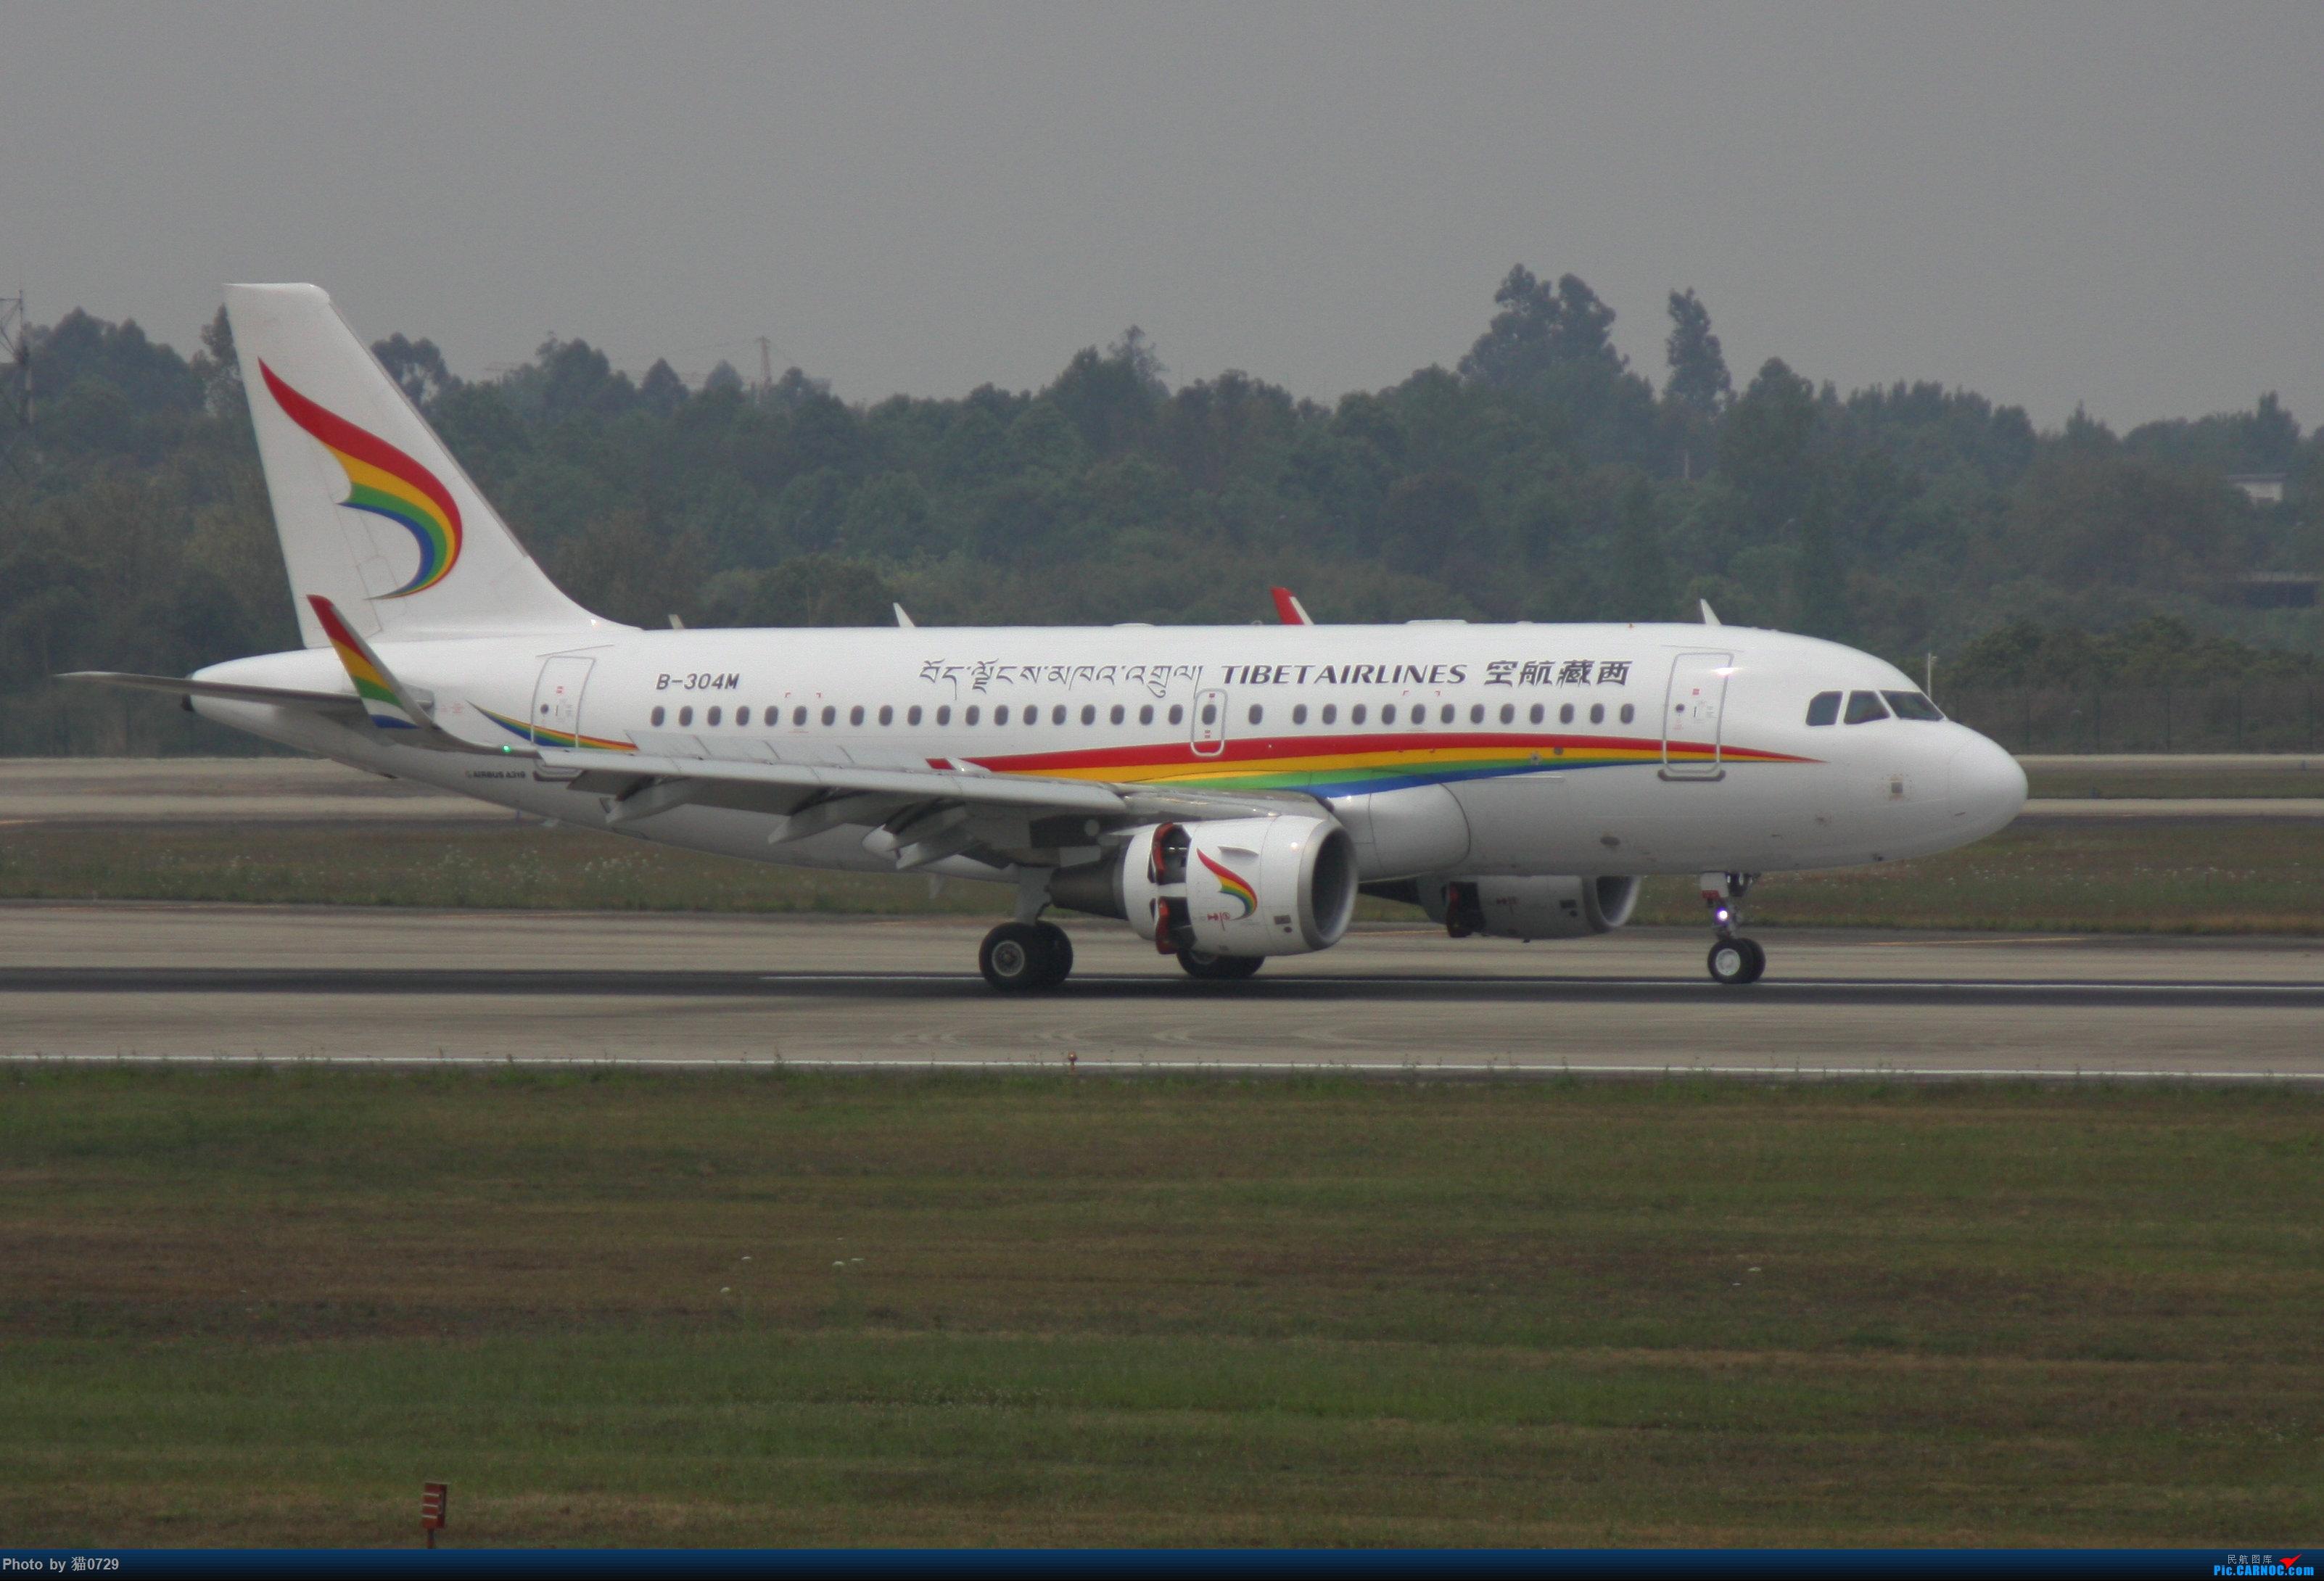 Re:[原创]CTU 119.425 水泥 伊朗346 巴基斯坦777 AIRBUS A319-100 B-304M 中国成都双流国际机场